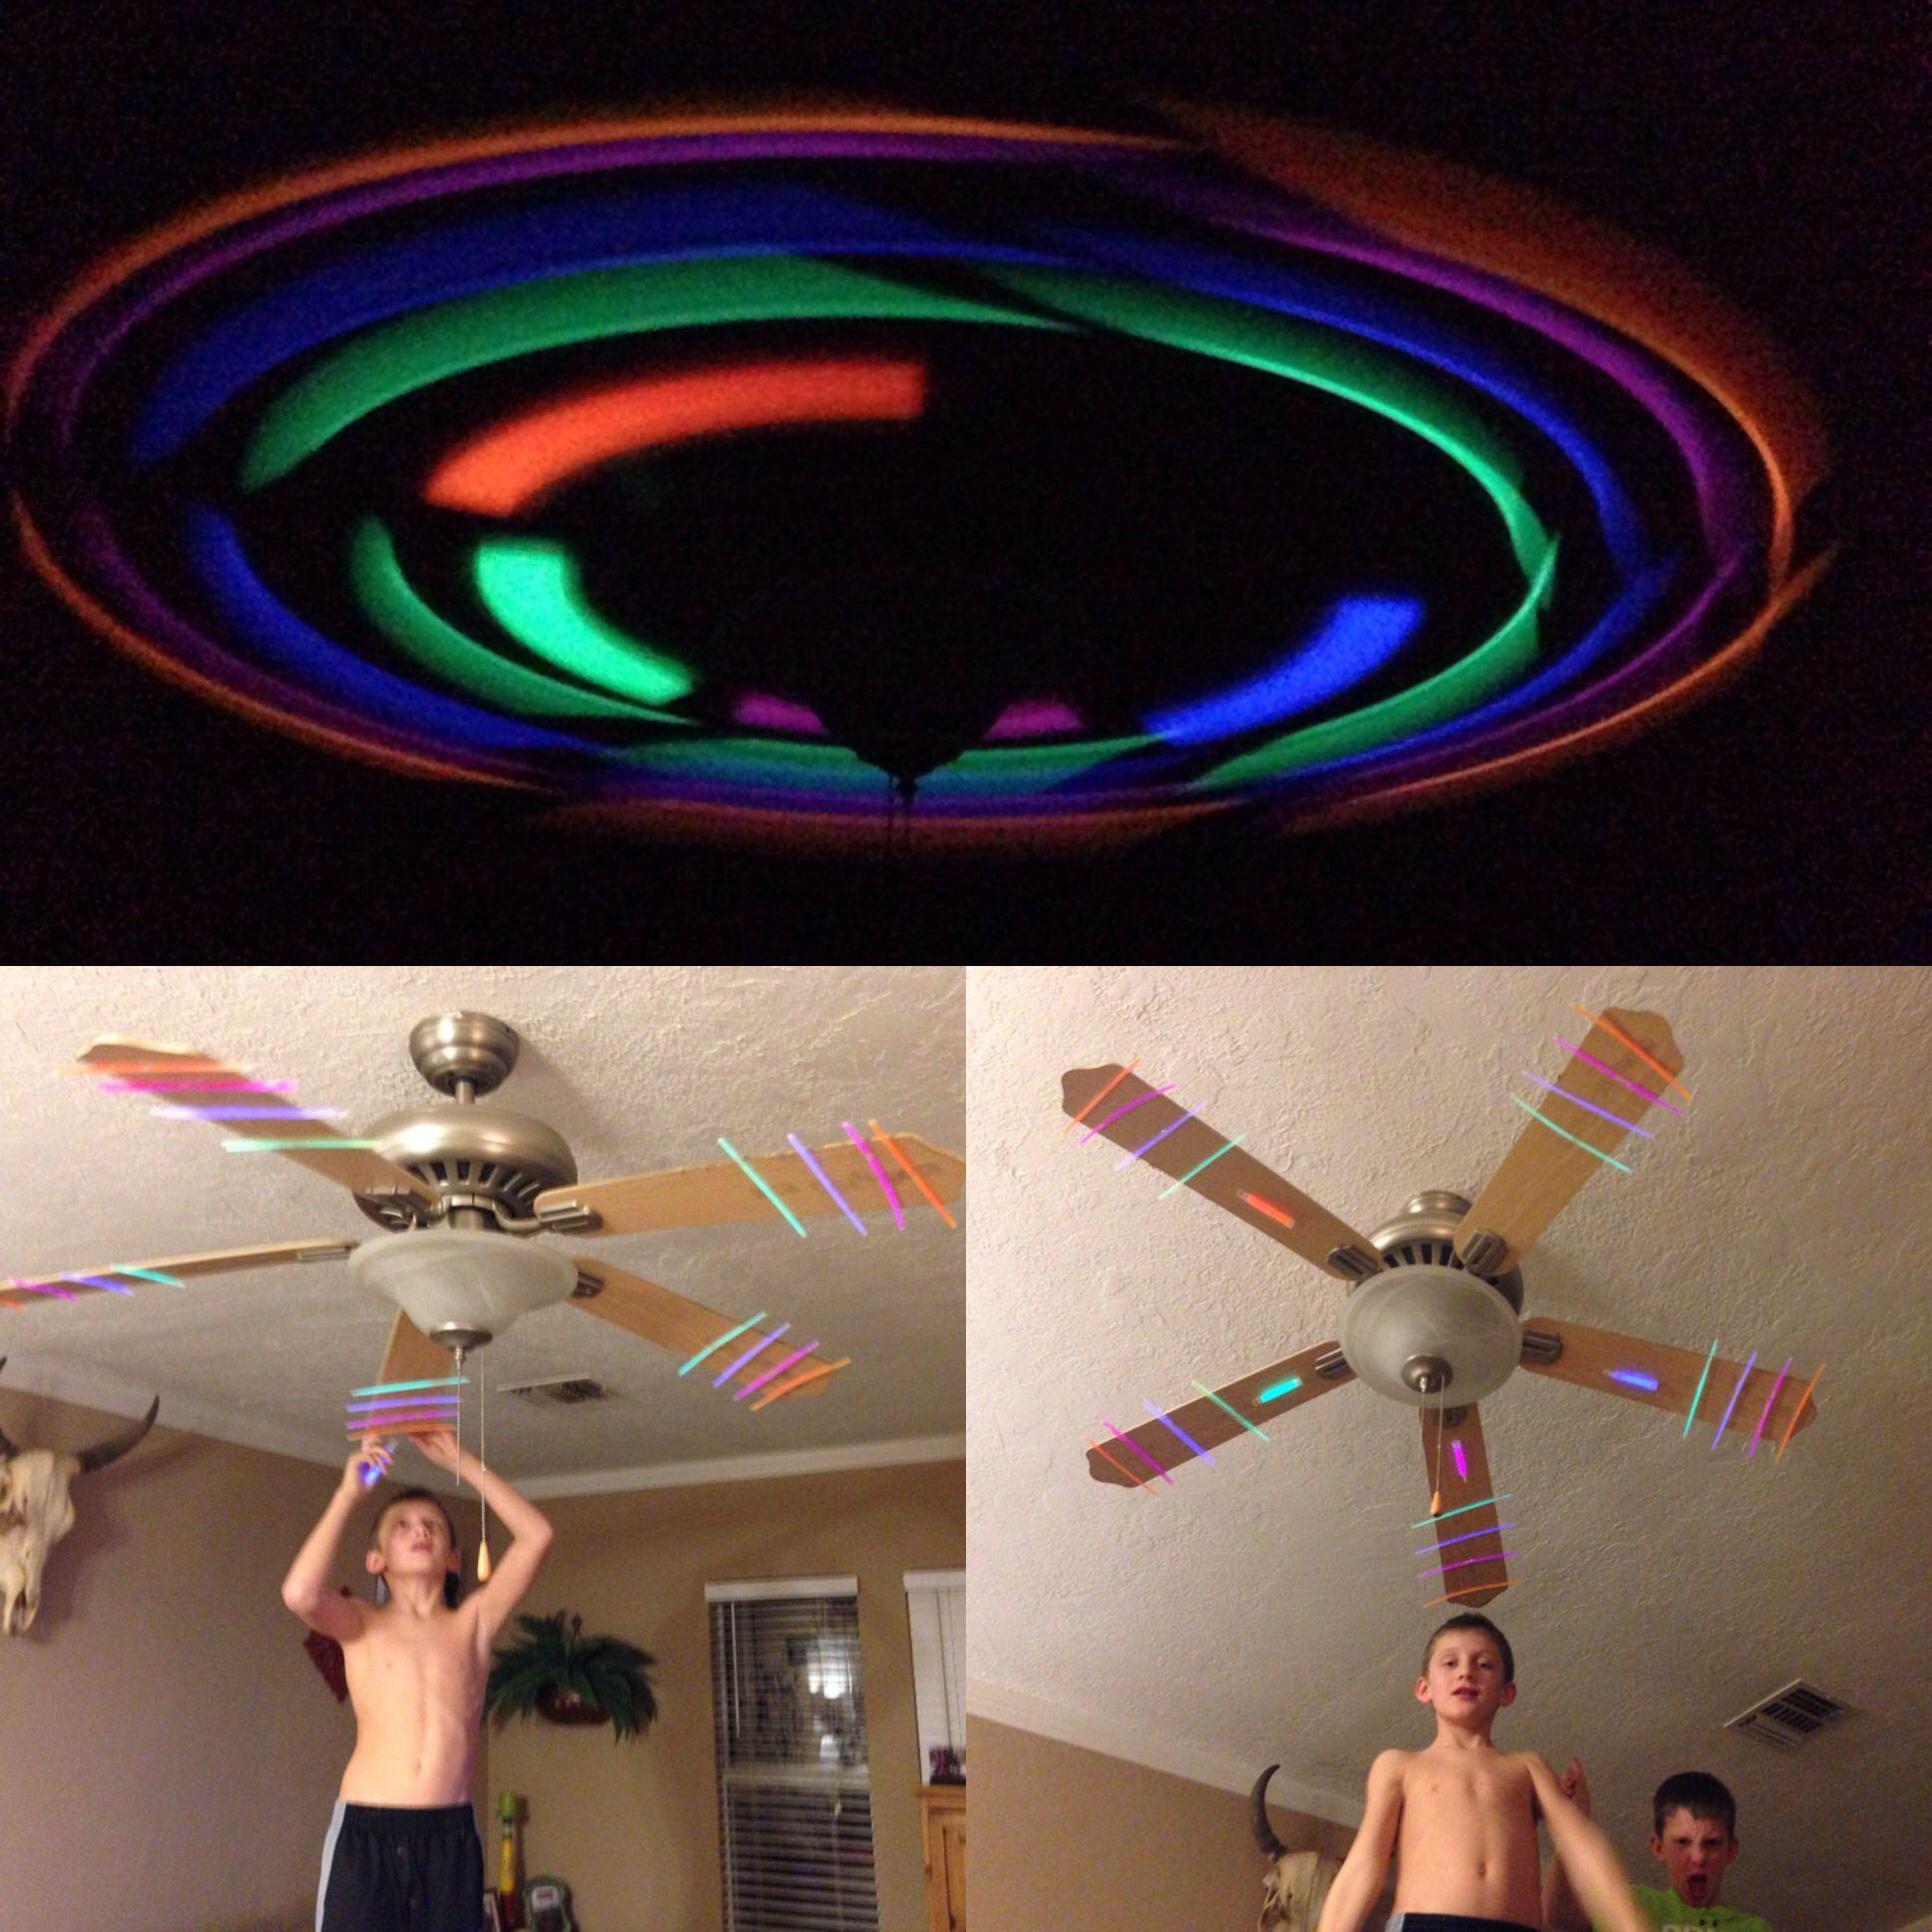 Glow Sticks Ceiling Fan Friday Night Fun Glow Party Neon Birthday Party Neon Party